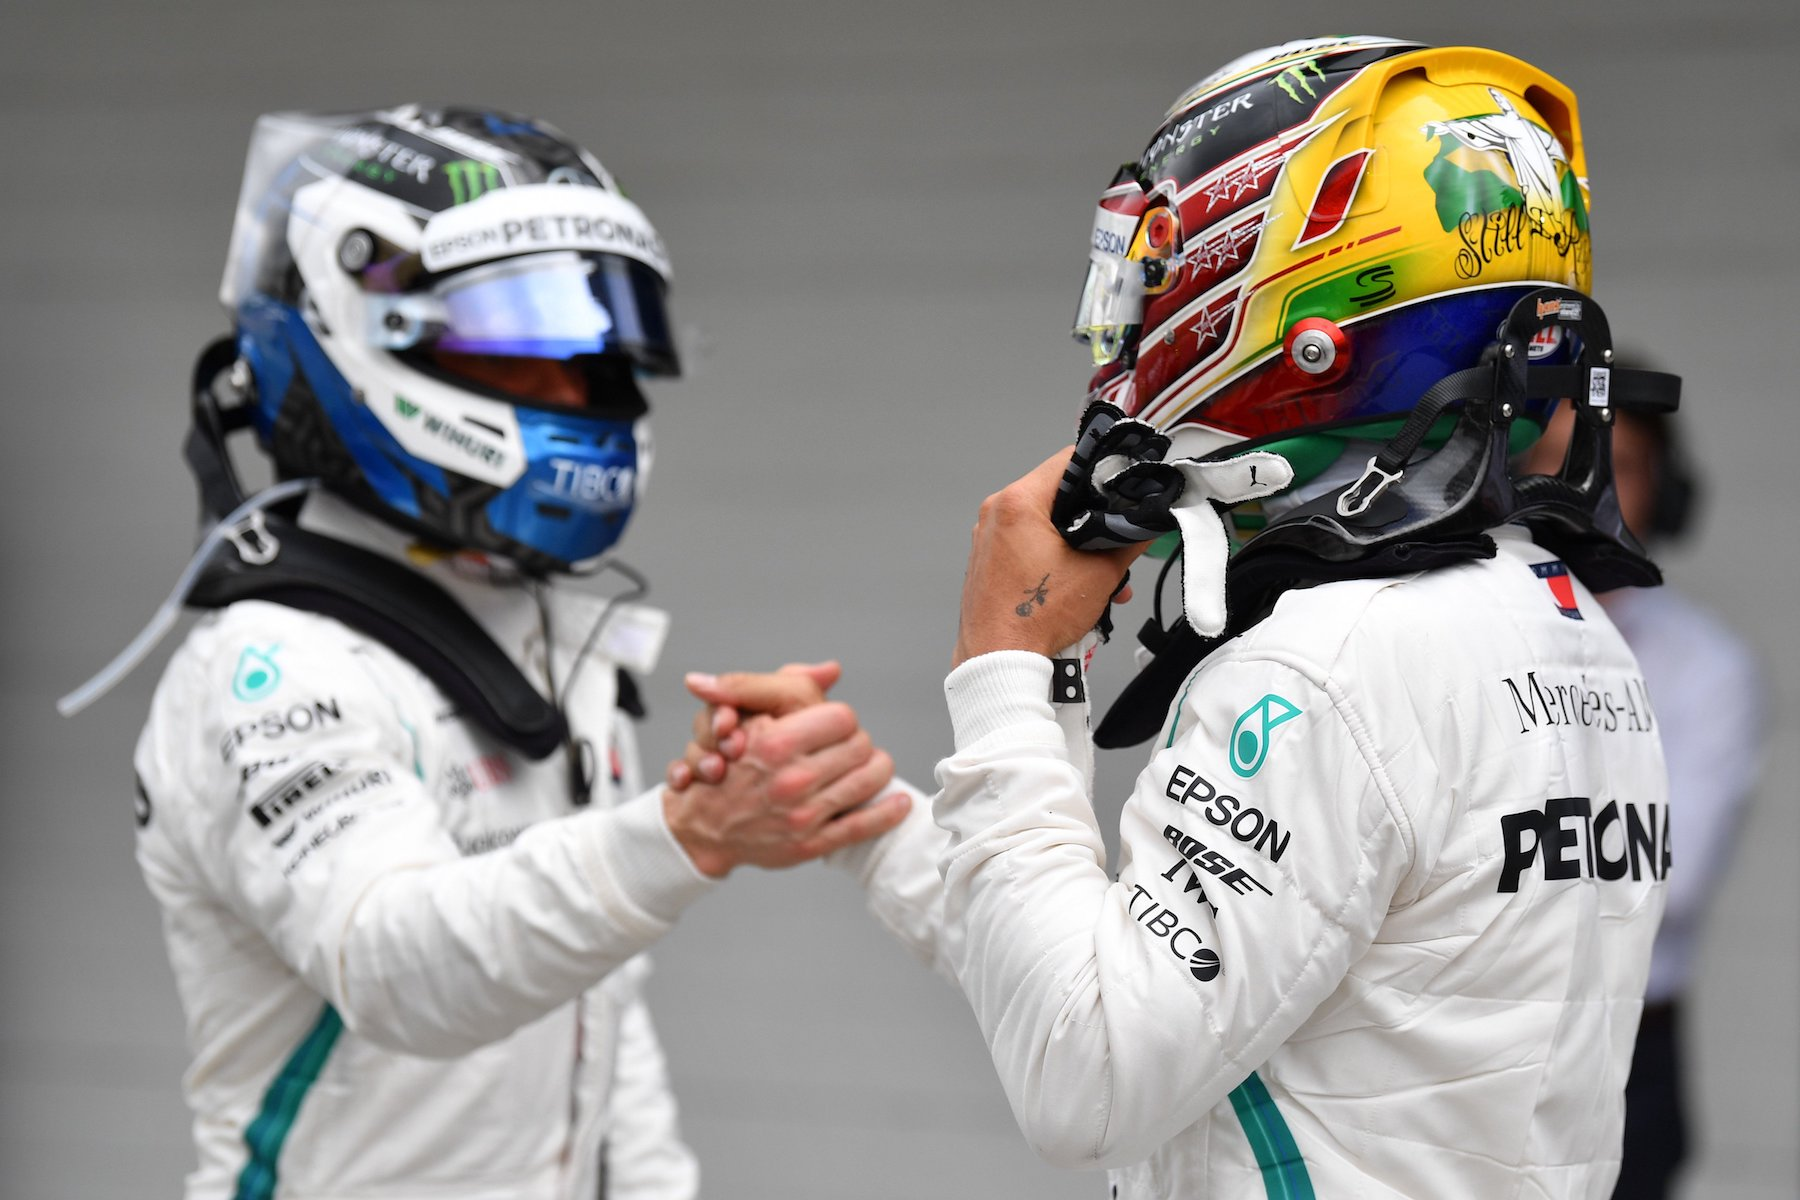 3 2018 Mercedes teammates | 2018 Brazilian GP 1 copy.jpg